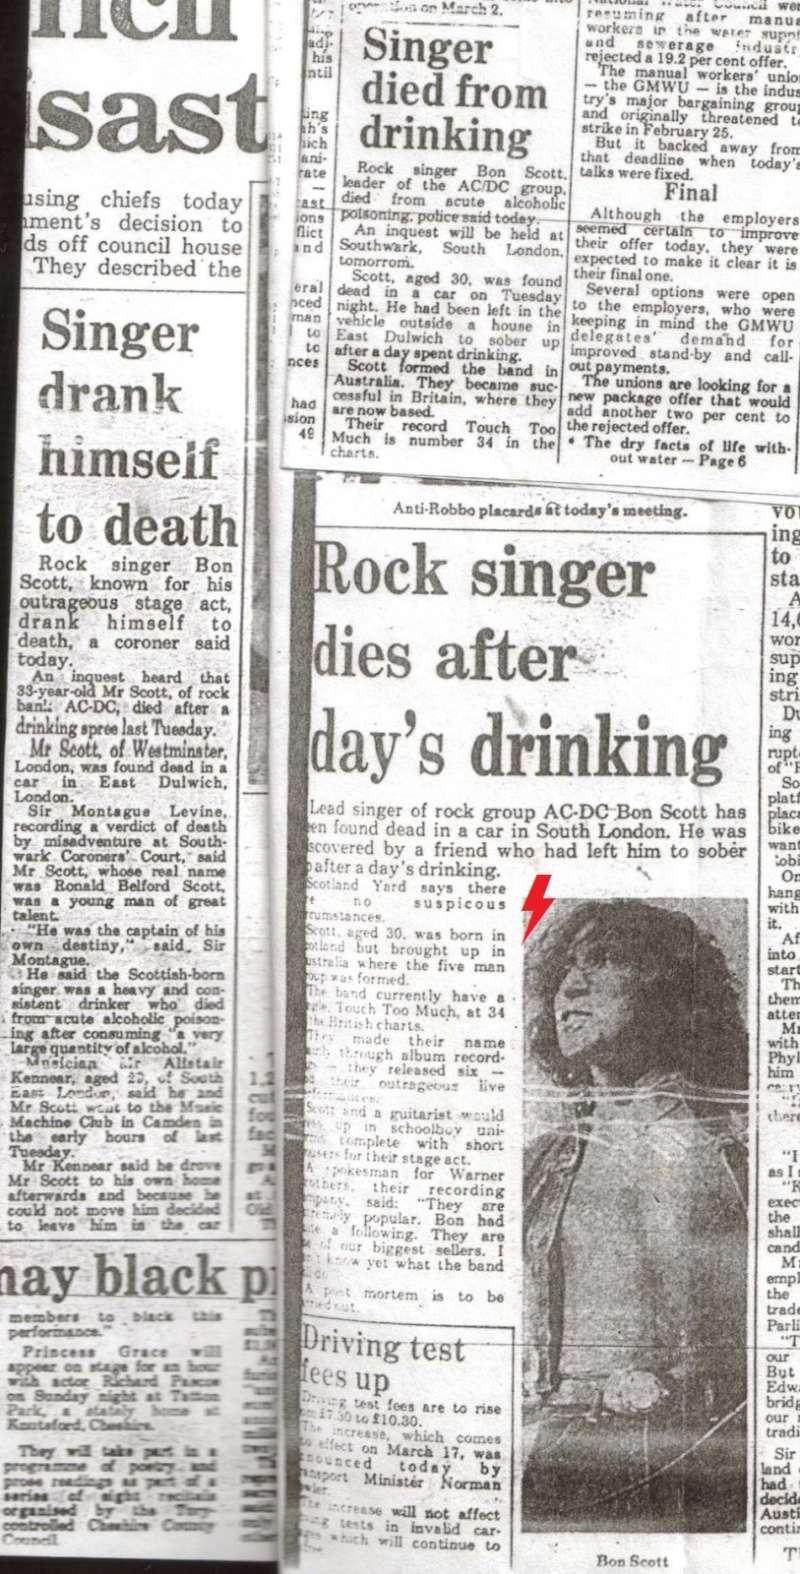 A tragic night 615